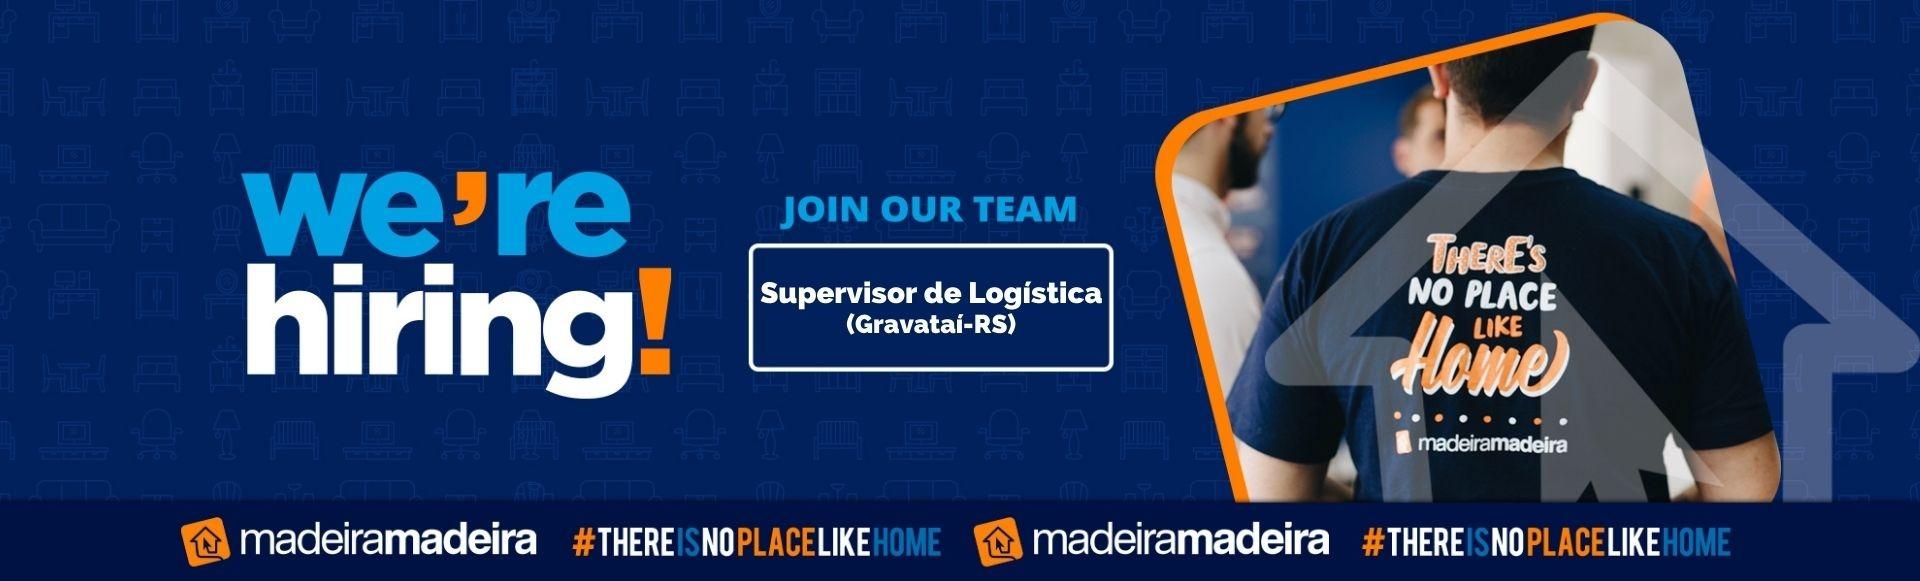 Supervisor de Logística (Gravataí-RS)